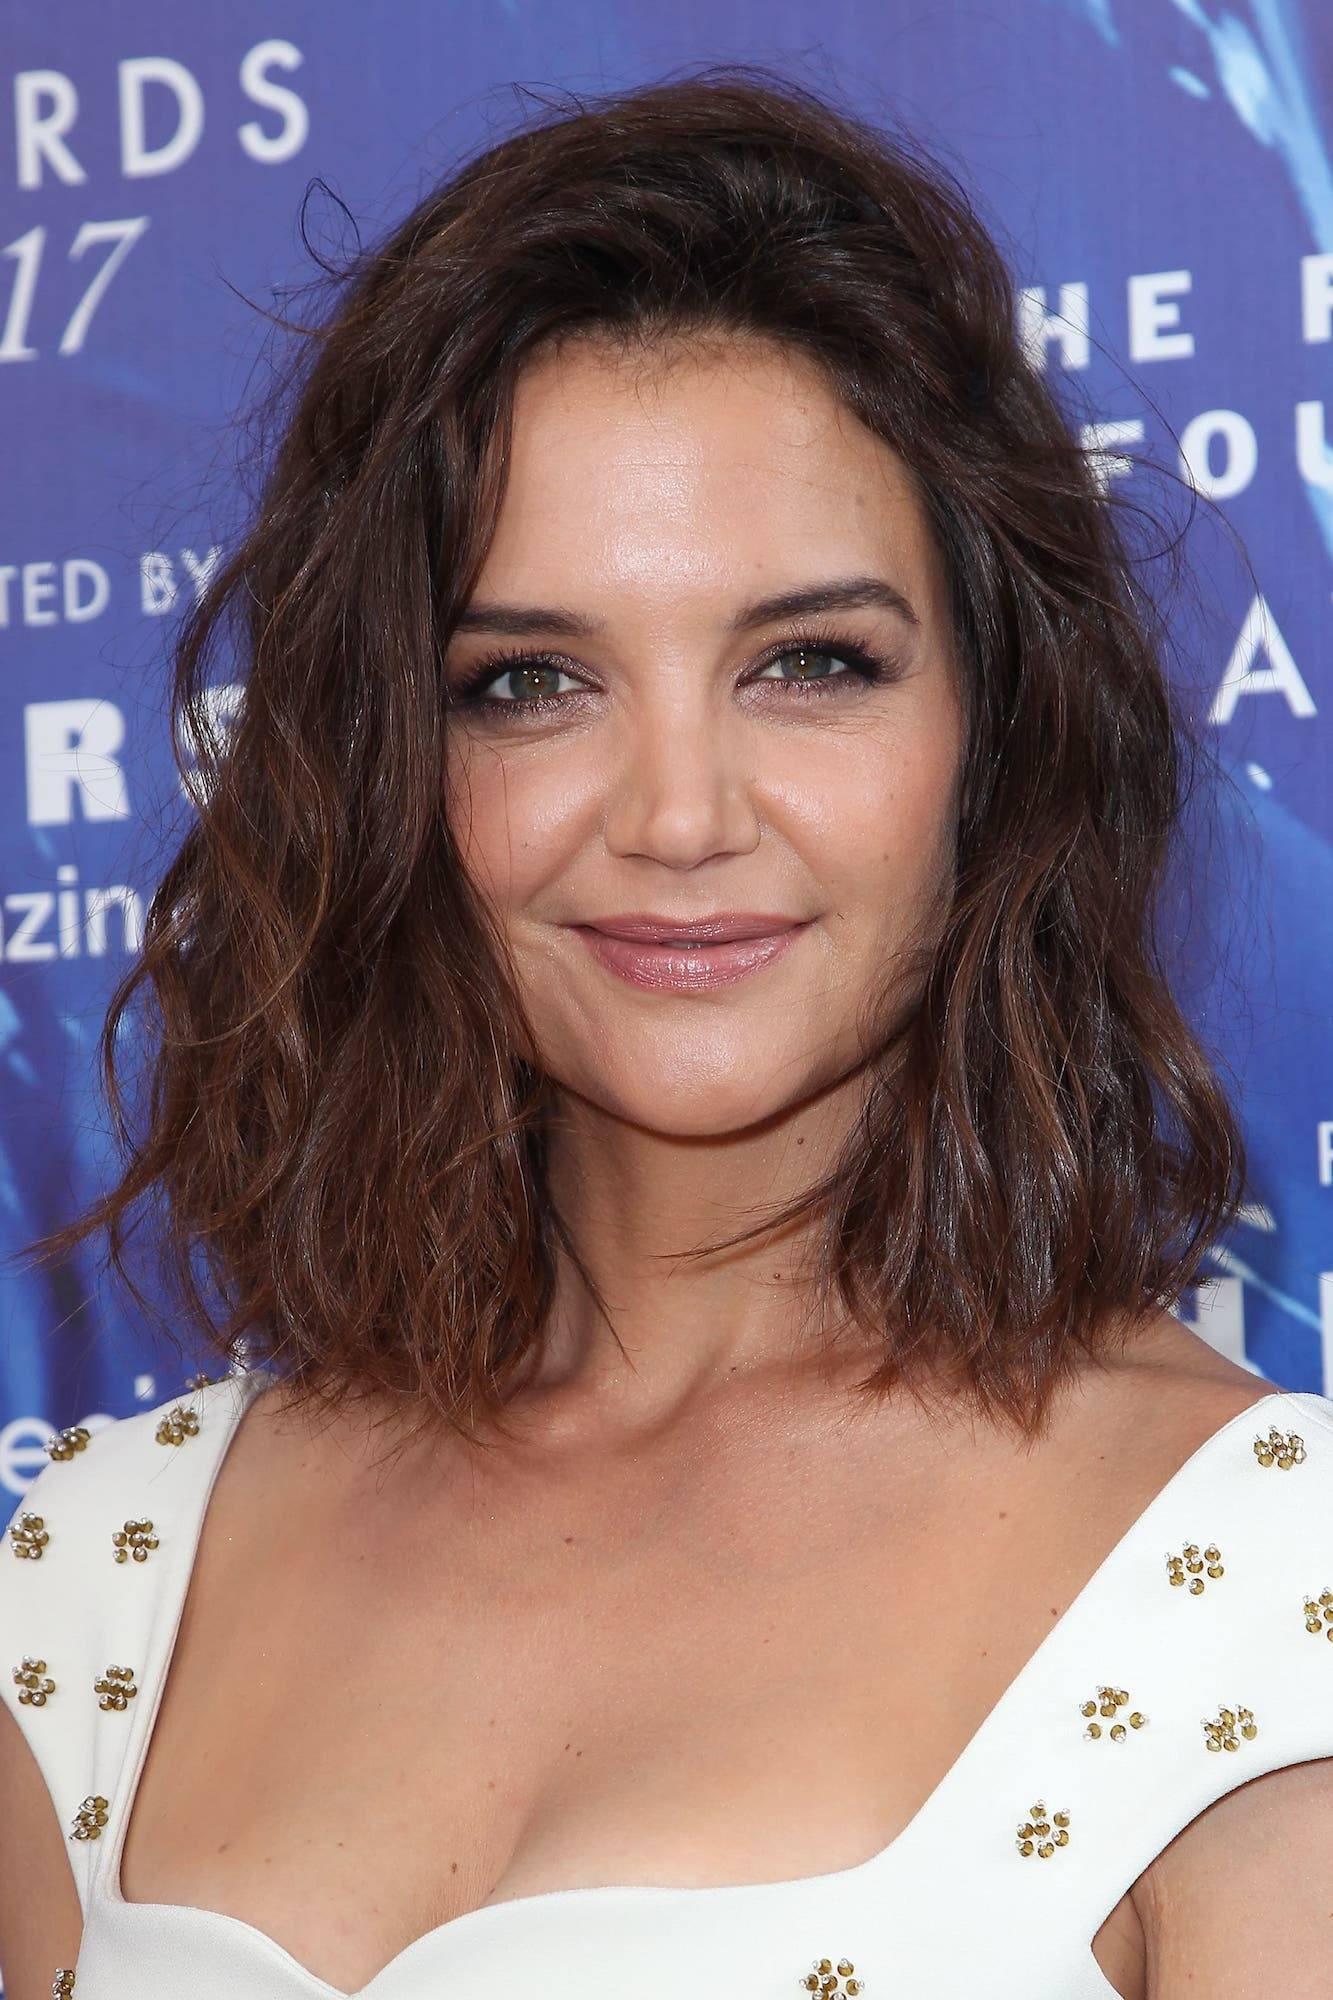 Katie Holmes potongan rambut keriting pendek untuk wajah bulat.